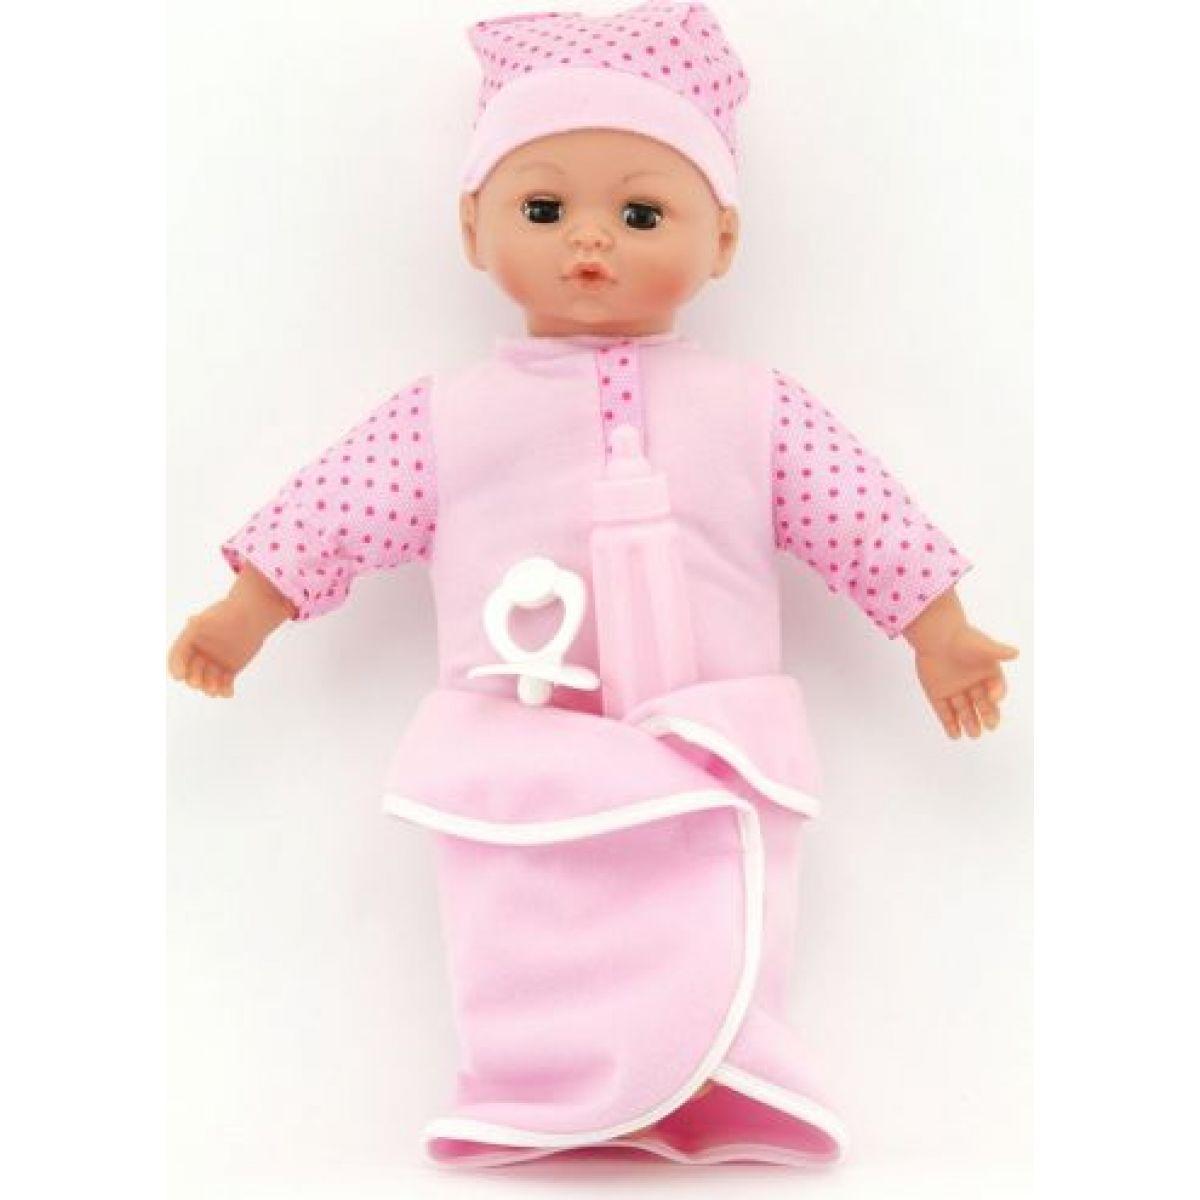 Bábika Bábätko s mäkkým telíčkom